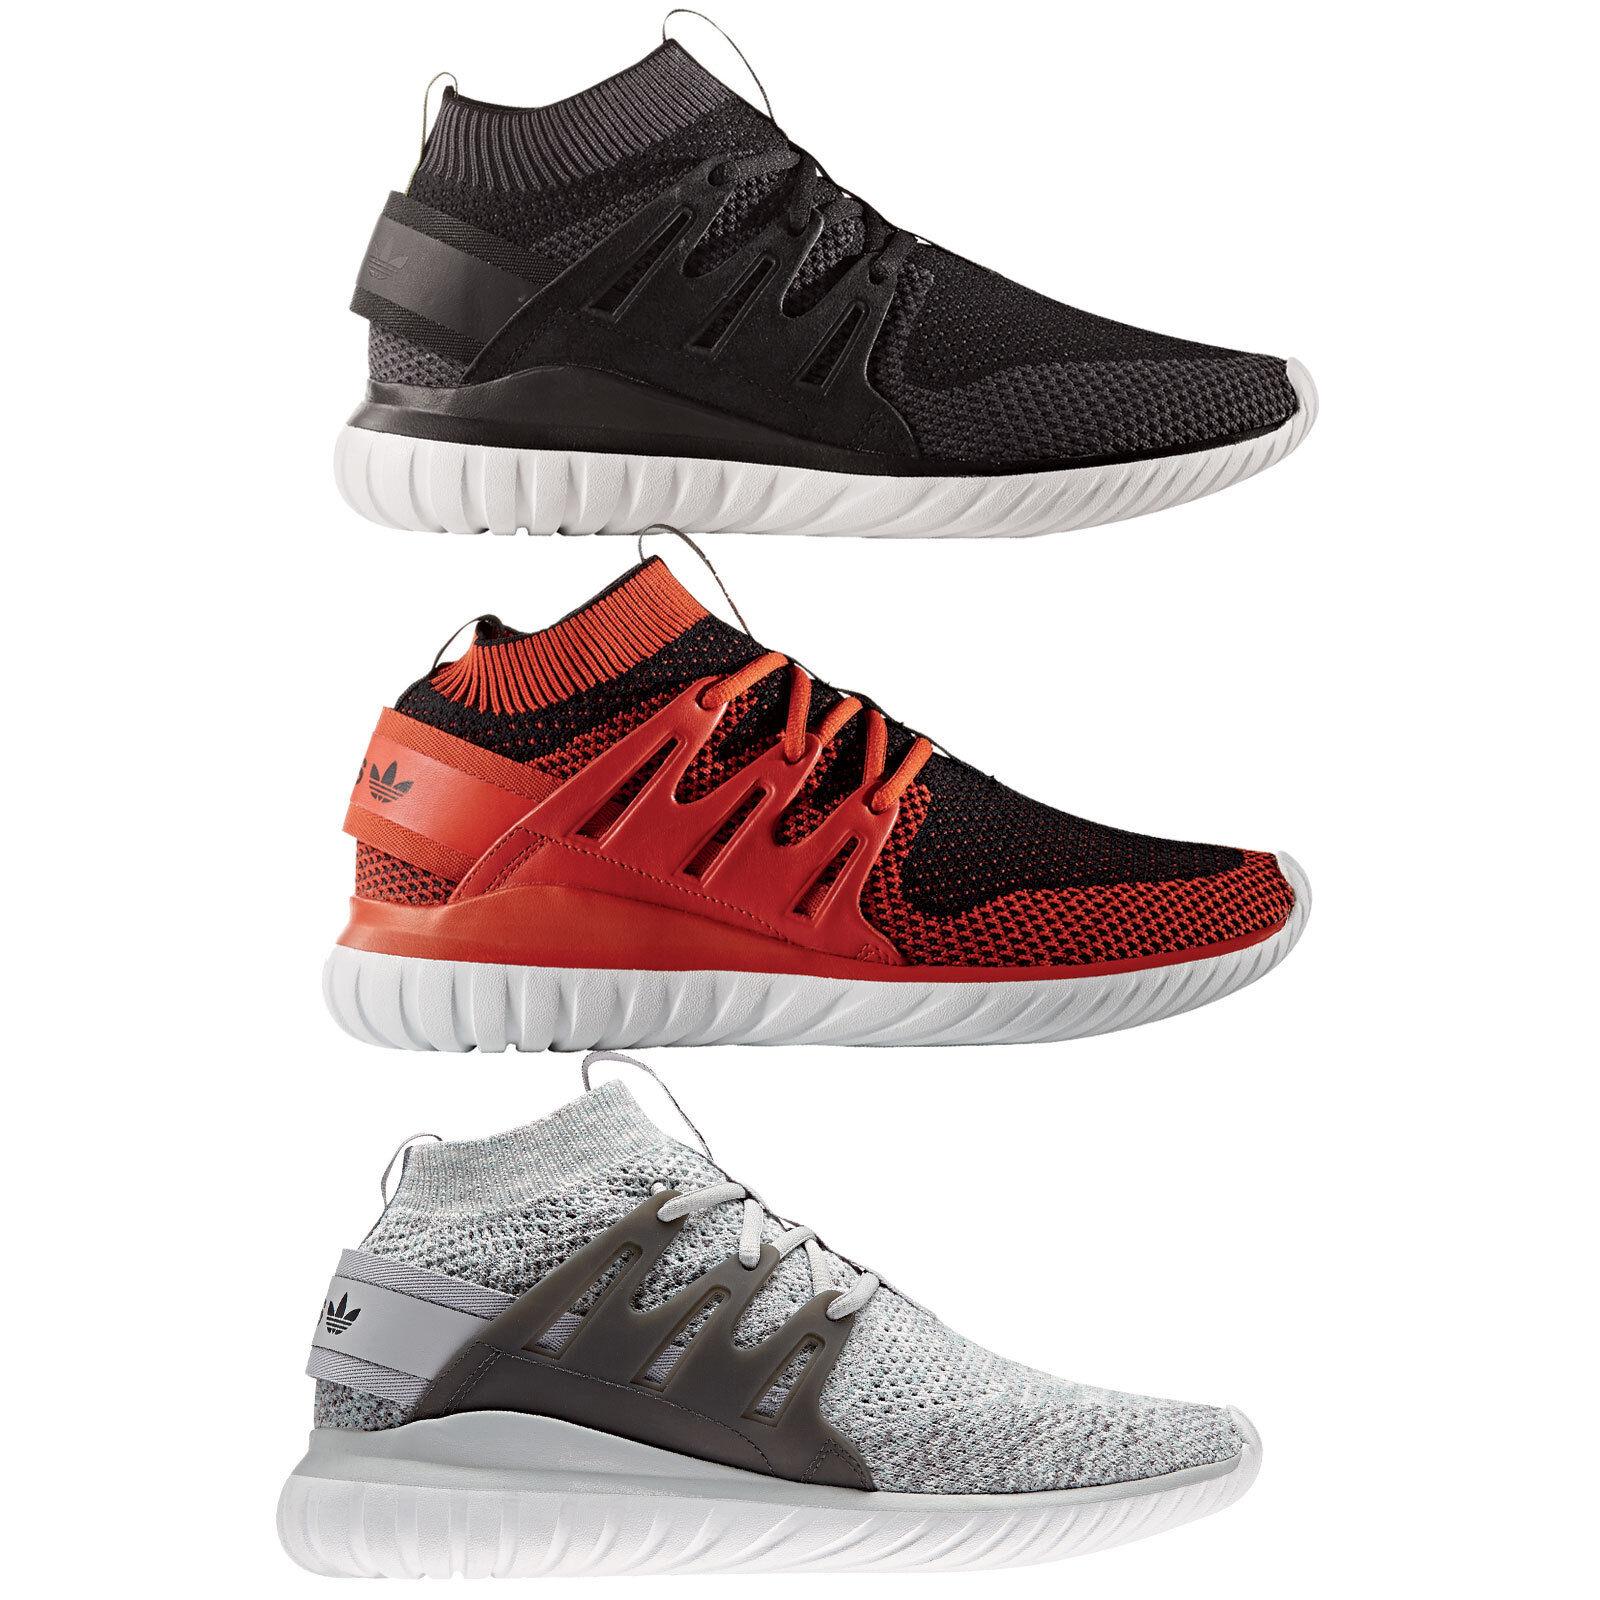 Adidas Originals Tubular Nova PK Primeknit Turnschuhe Schuhe Turnschuhe Sportschuhe Vintage Flut Schuhe